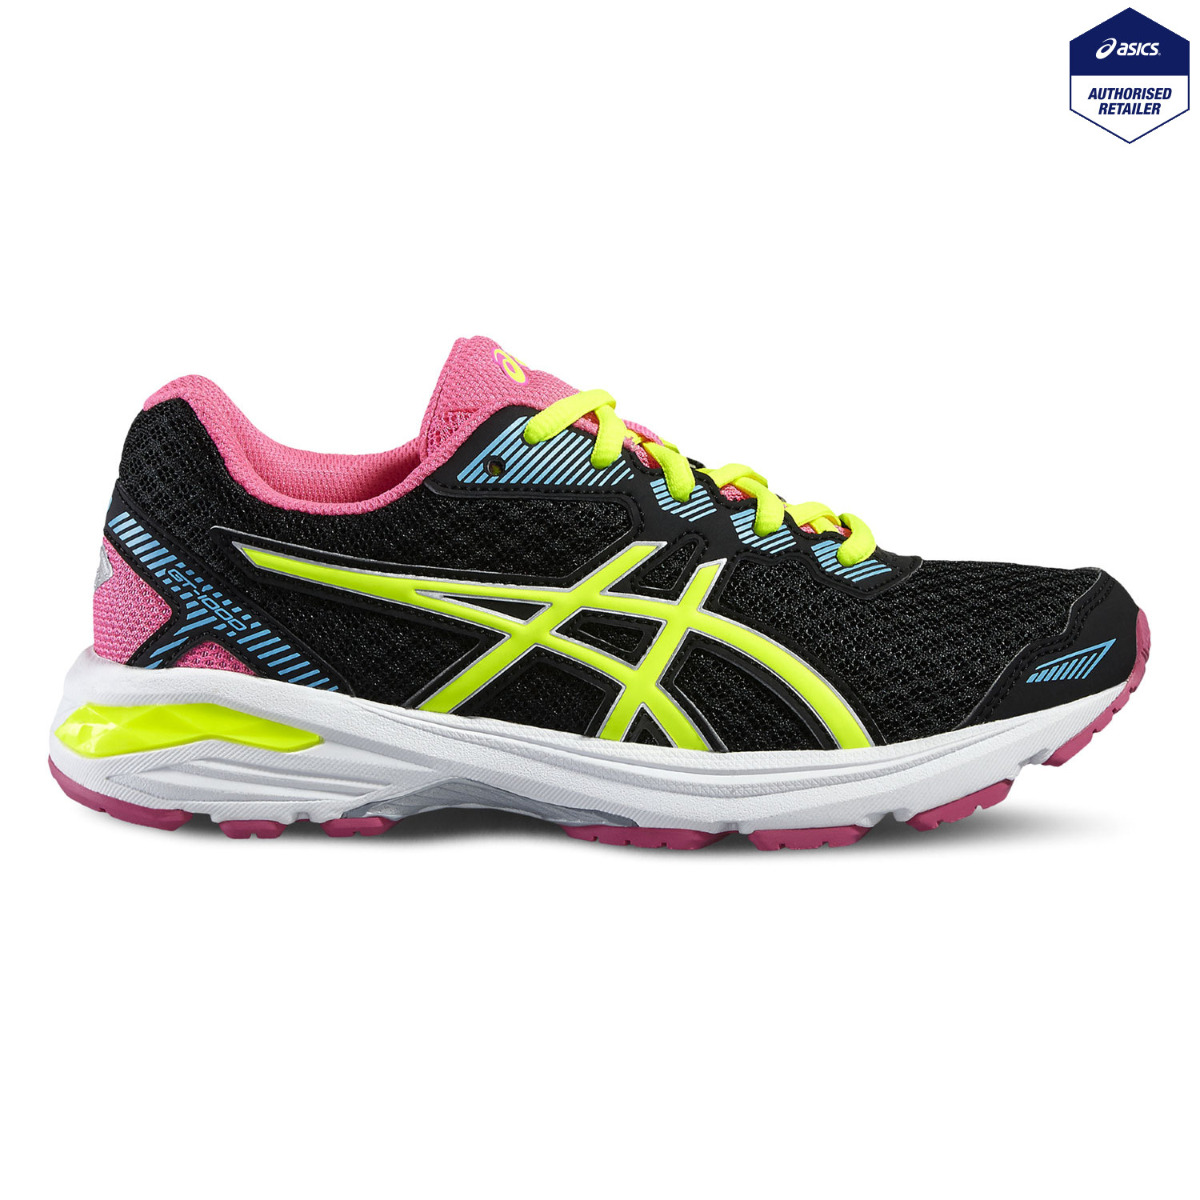 Asics Gel GT-1000 5 GS | Kids running shoes | mysport.lv